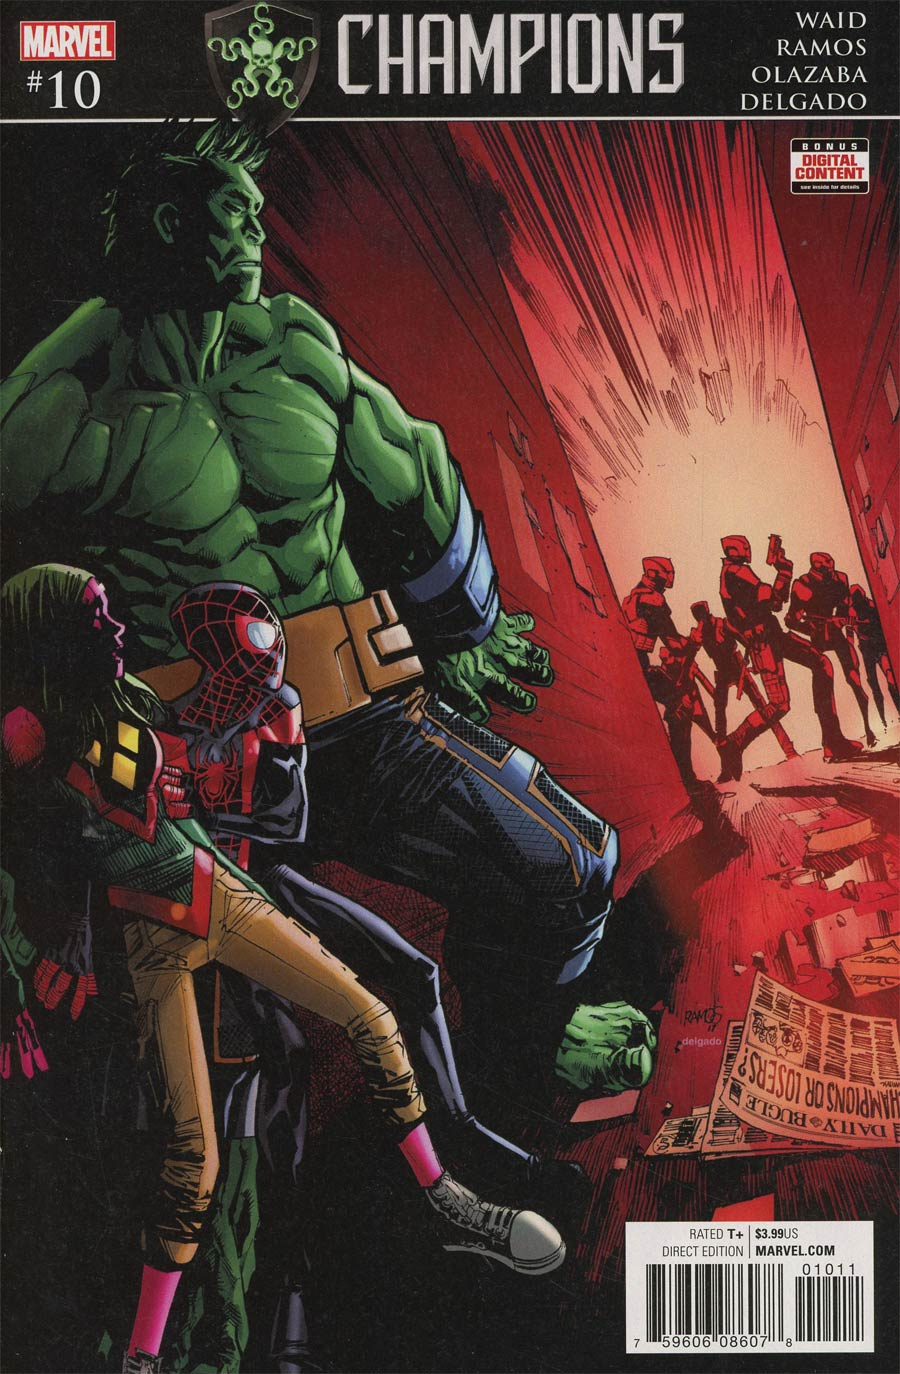 Champions (Marvel) Vol 2 #10 Cover A Regular Humberto Ramos Cover (Secret Empire Tie-In)